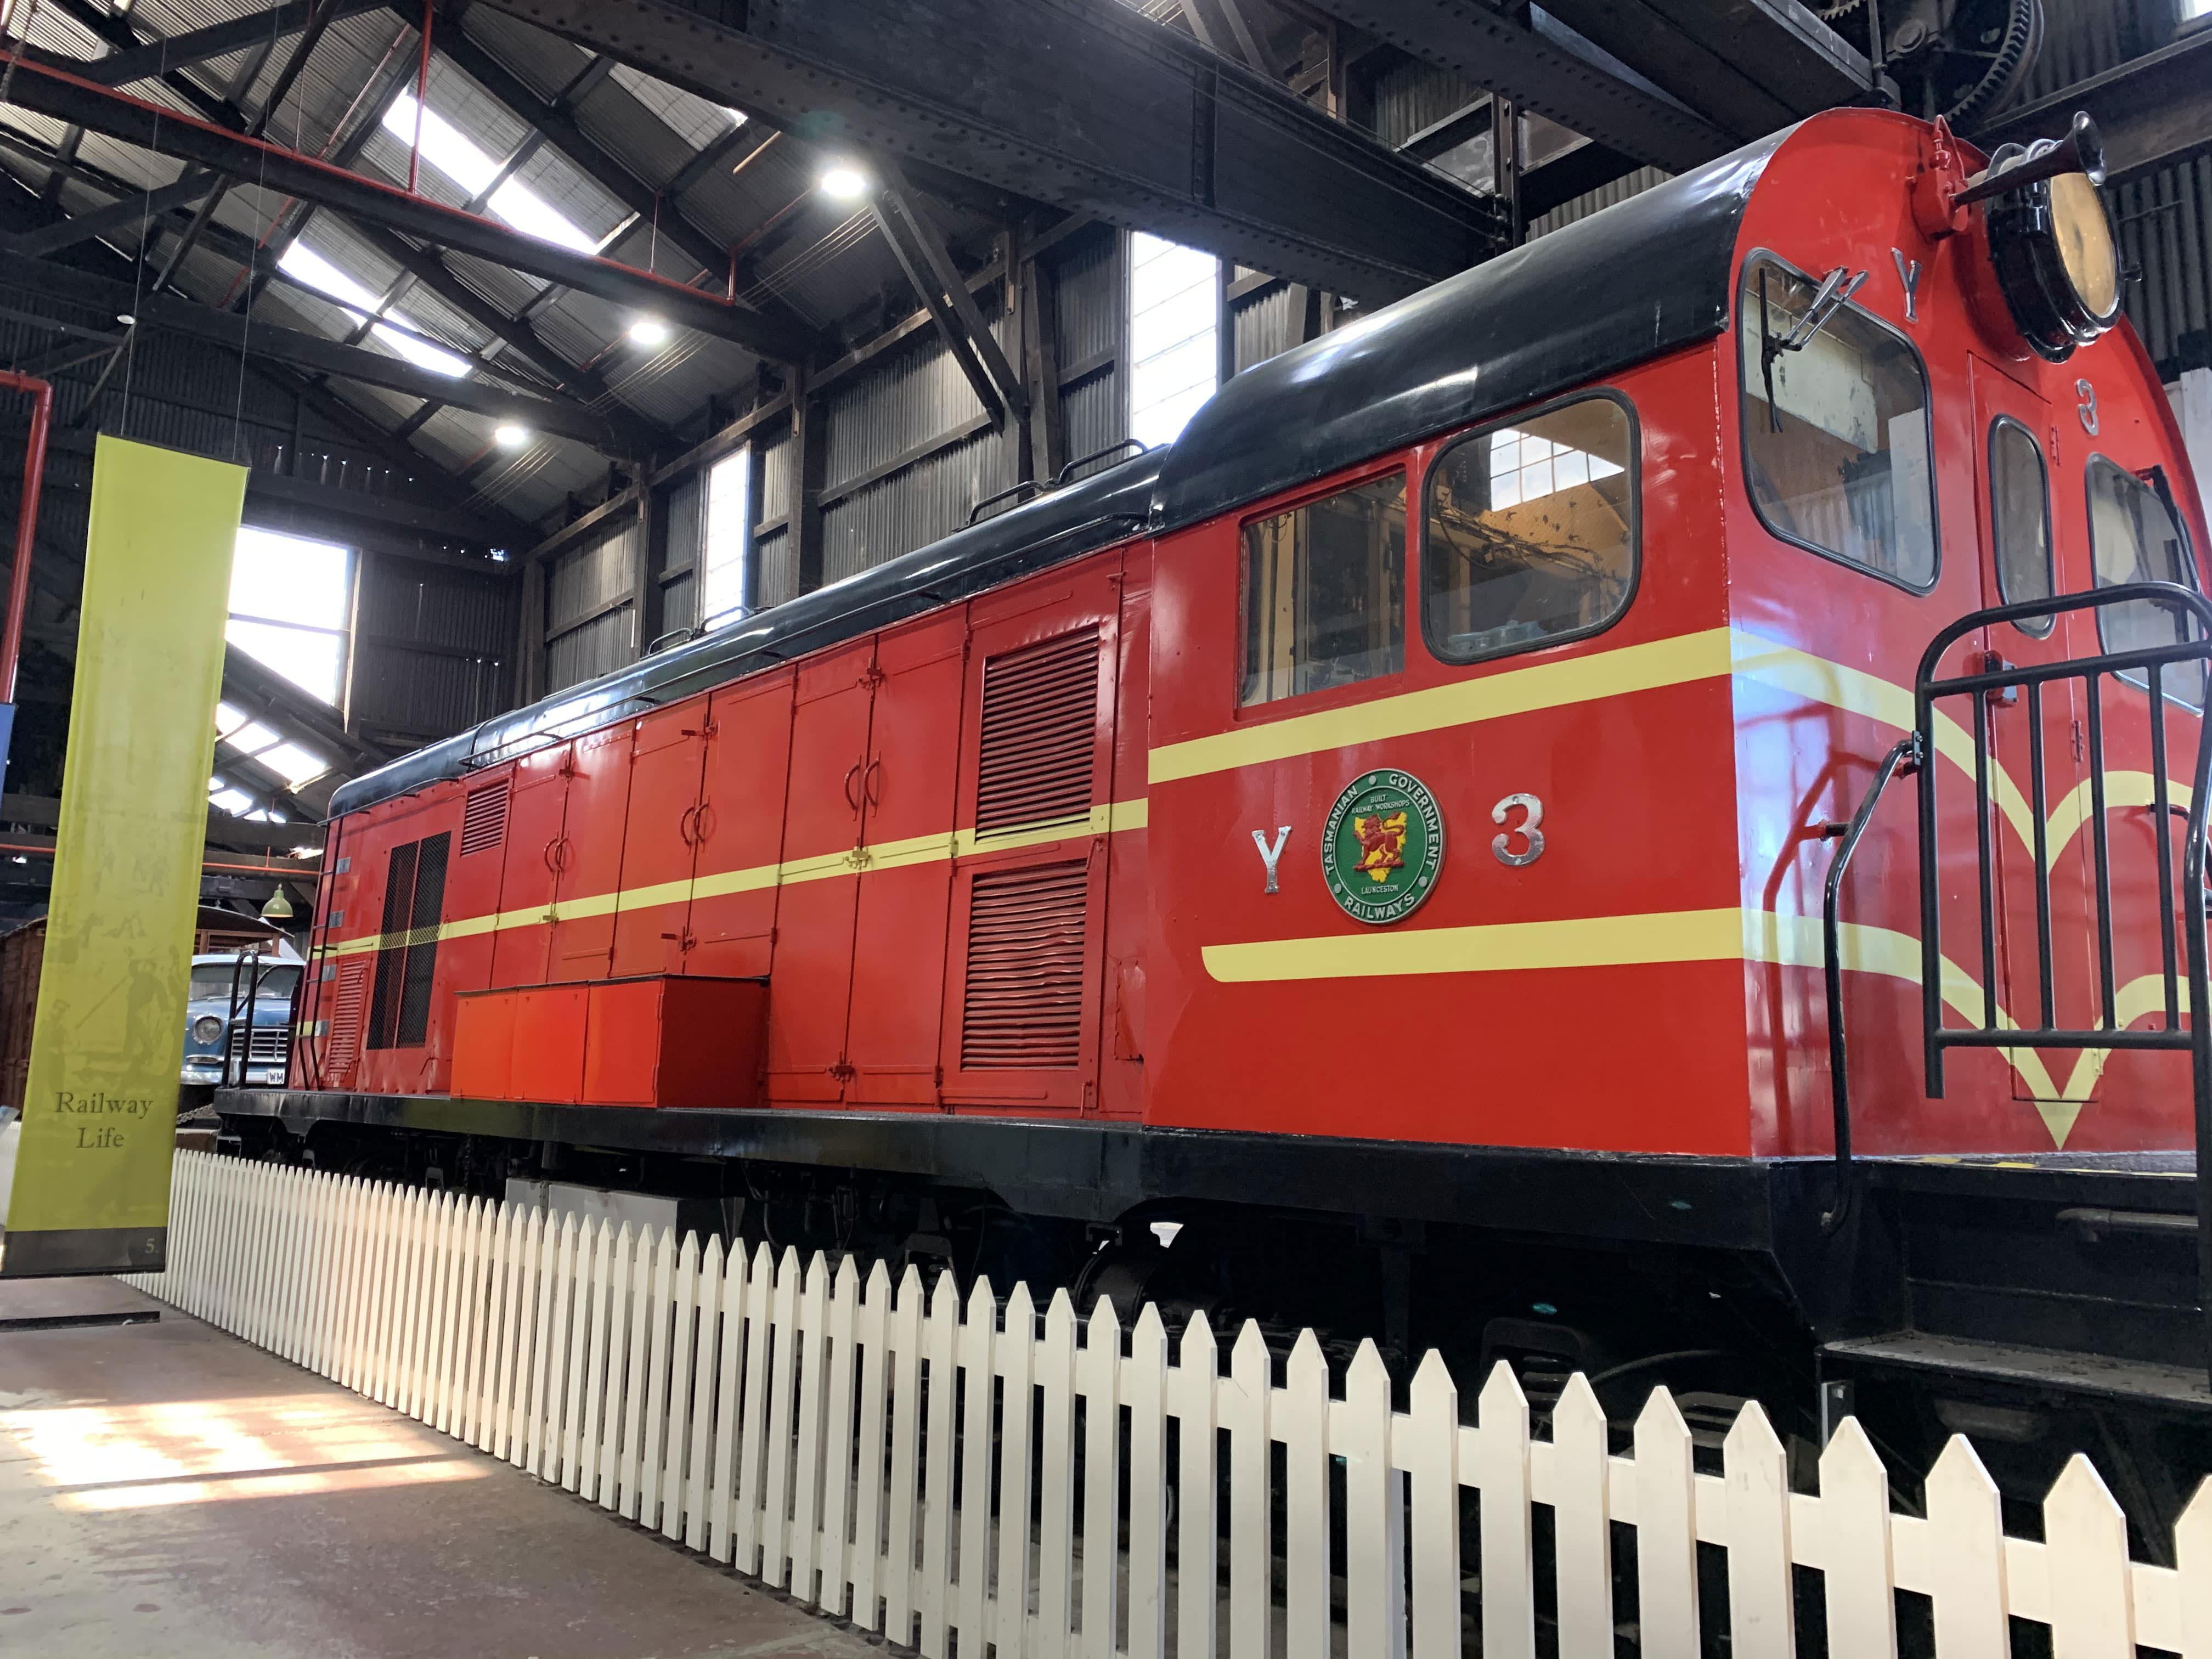 Vintage train in the railway workshop, QVM, Launceston